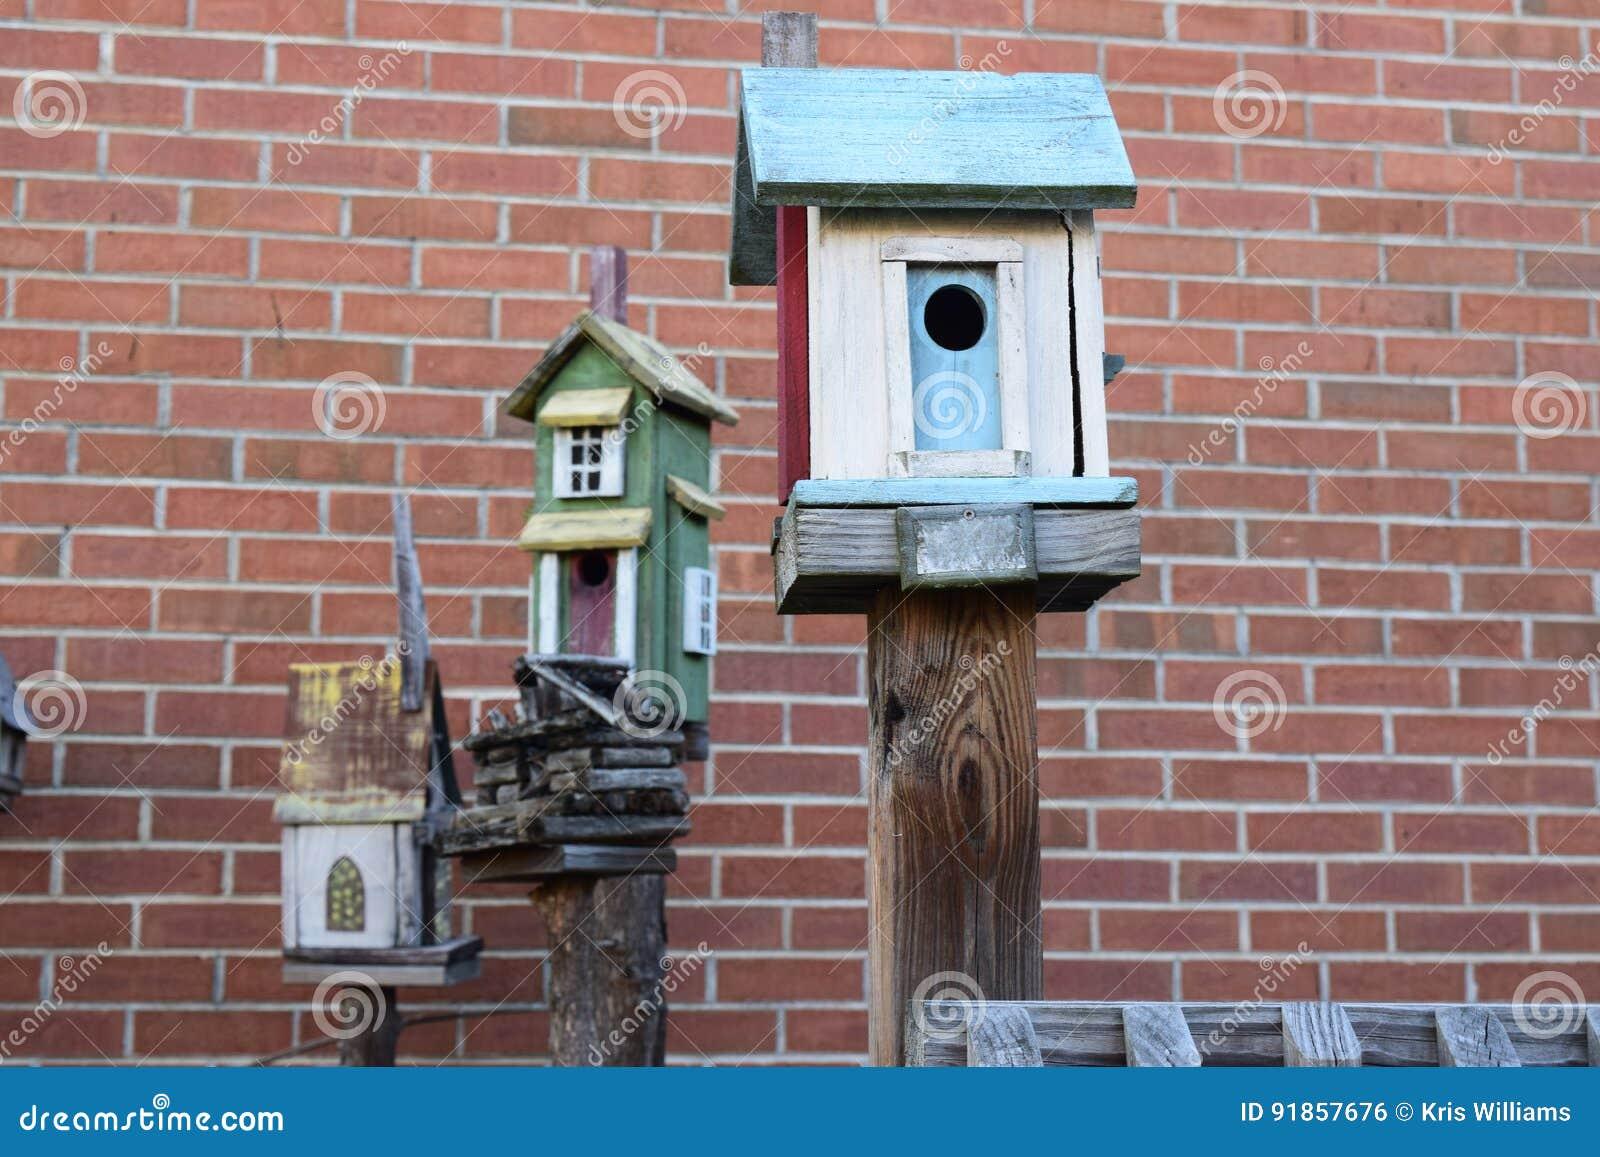 Three more bird houses on posts